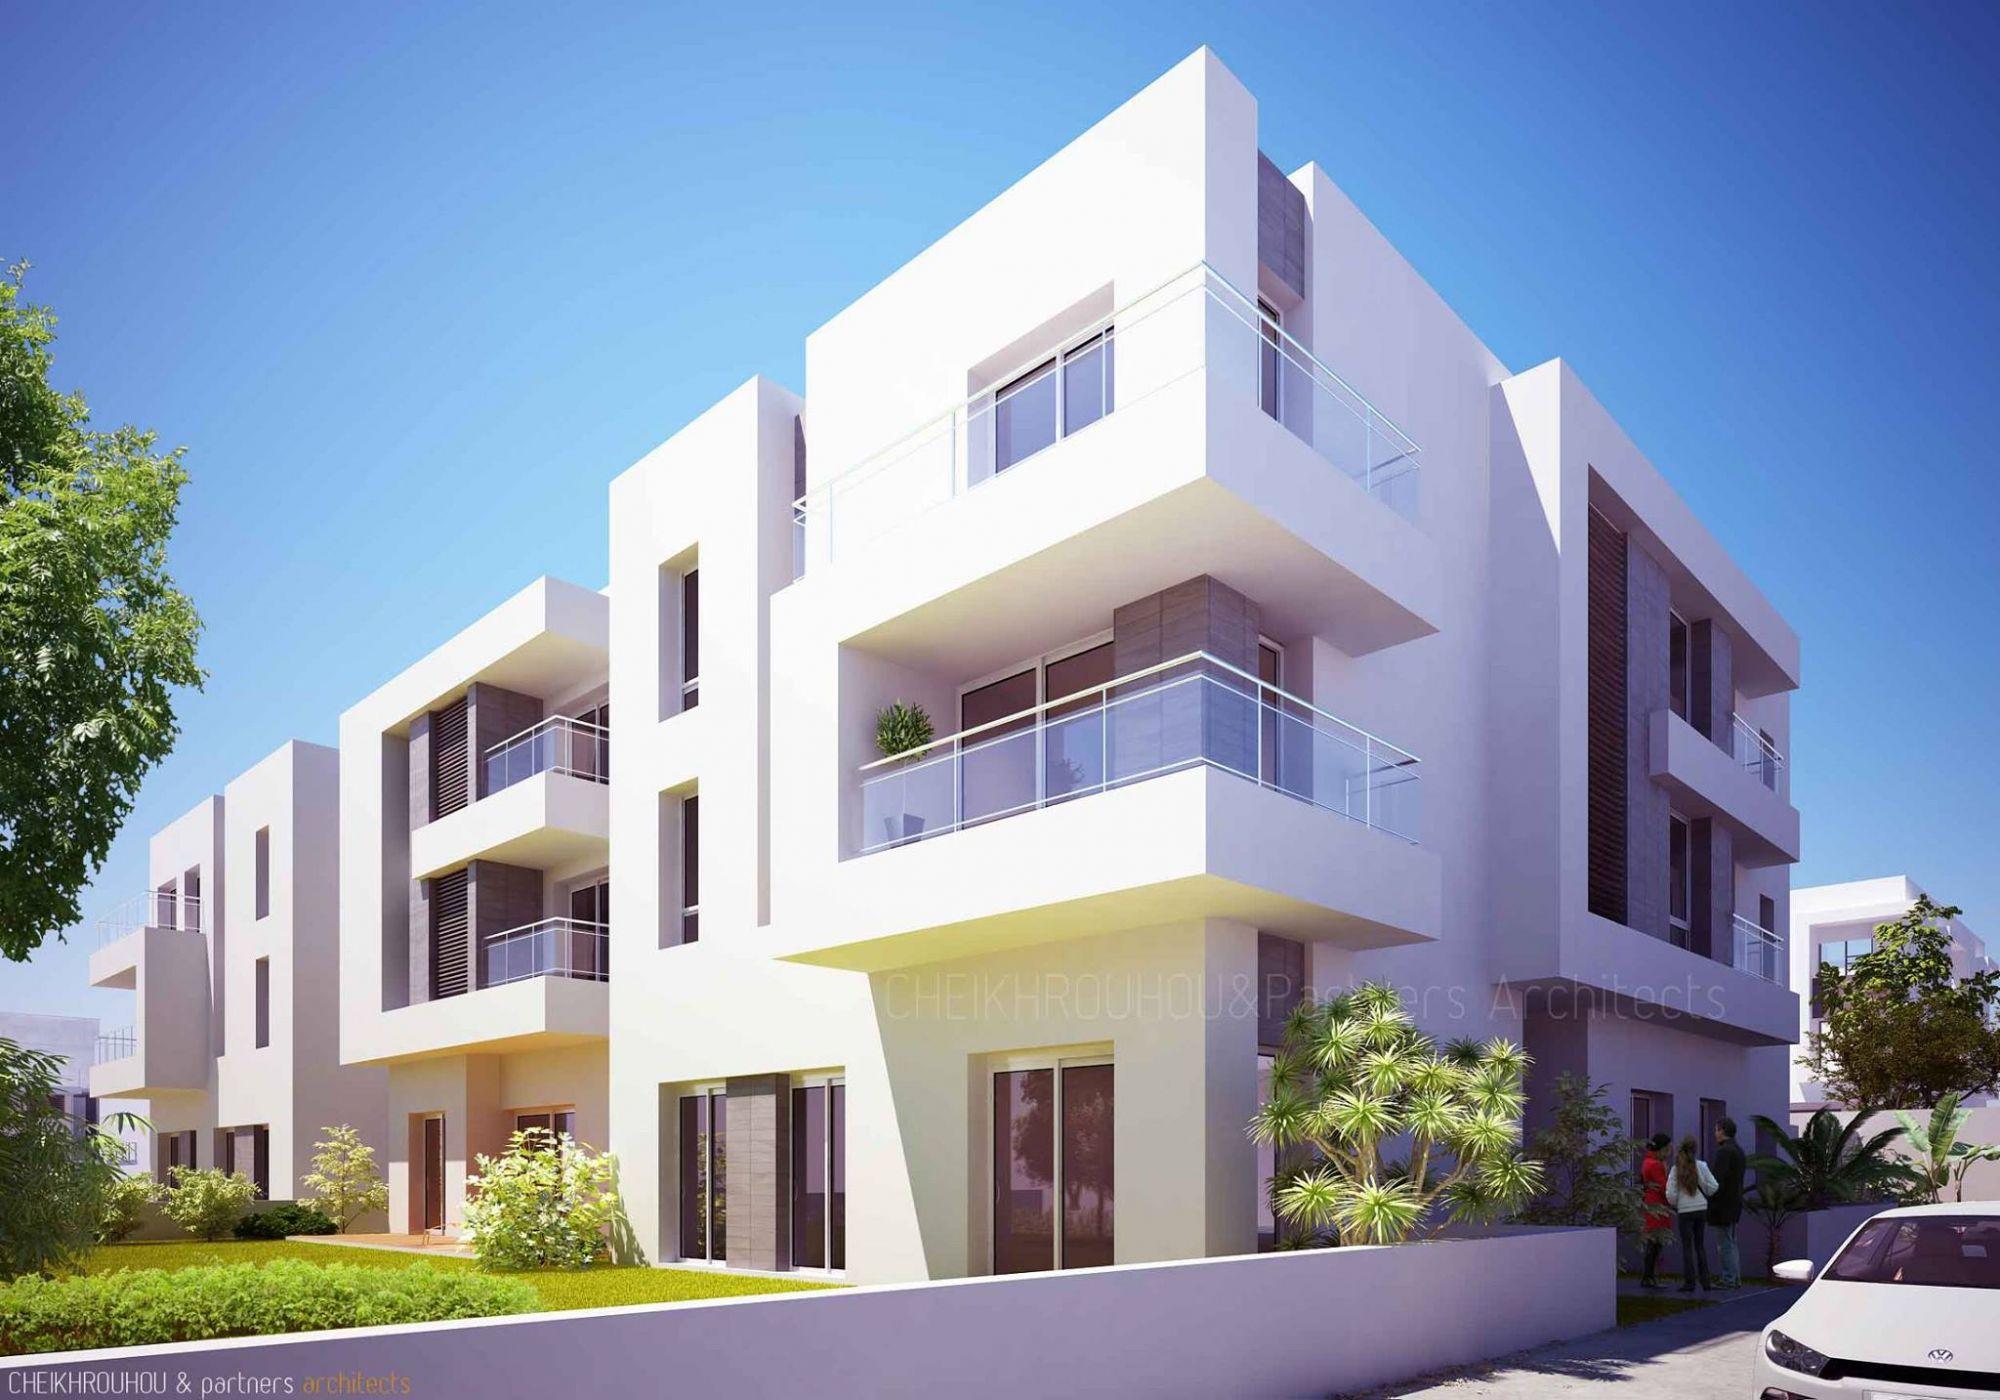 R sidence haut standing d 39 une architecture moderne vente appartement rades meliane - Residence de haut standing rubio ...